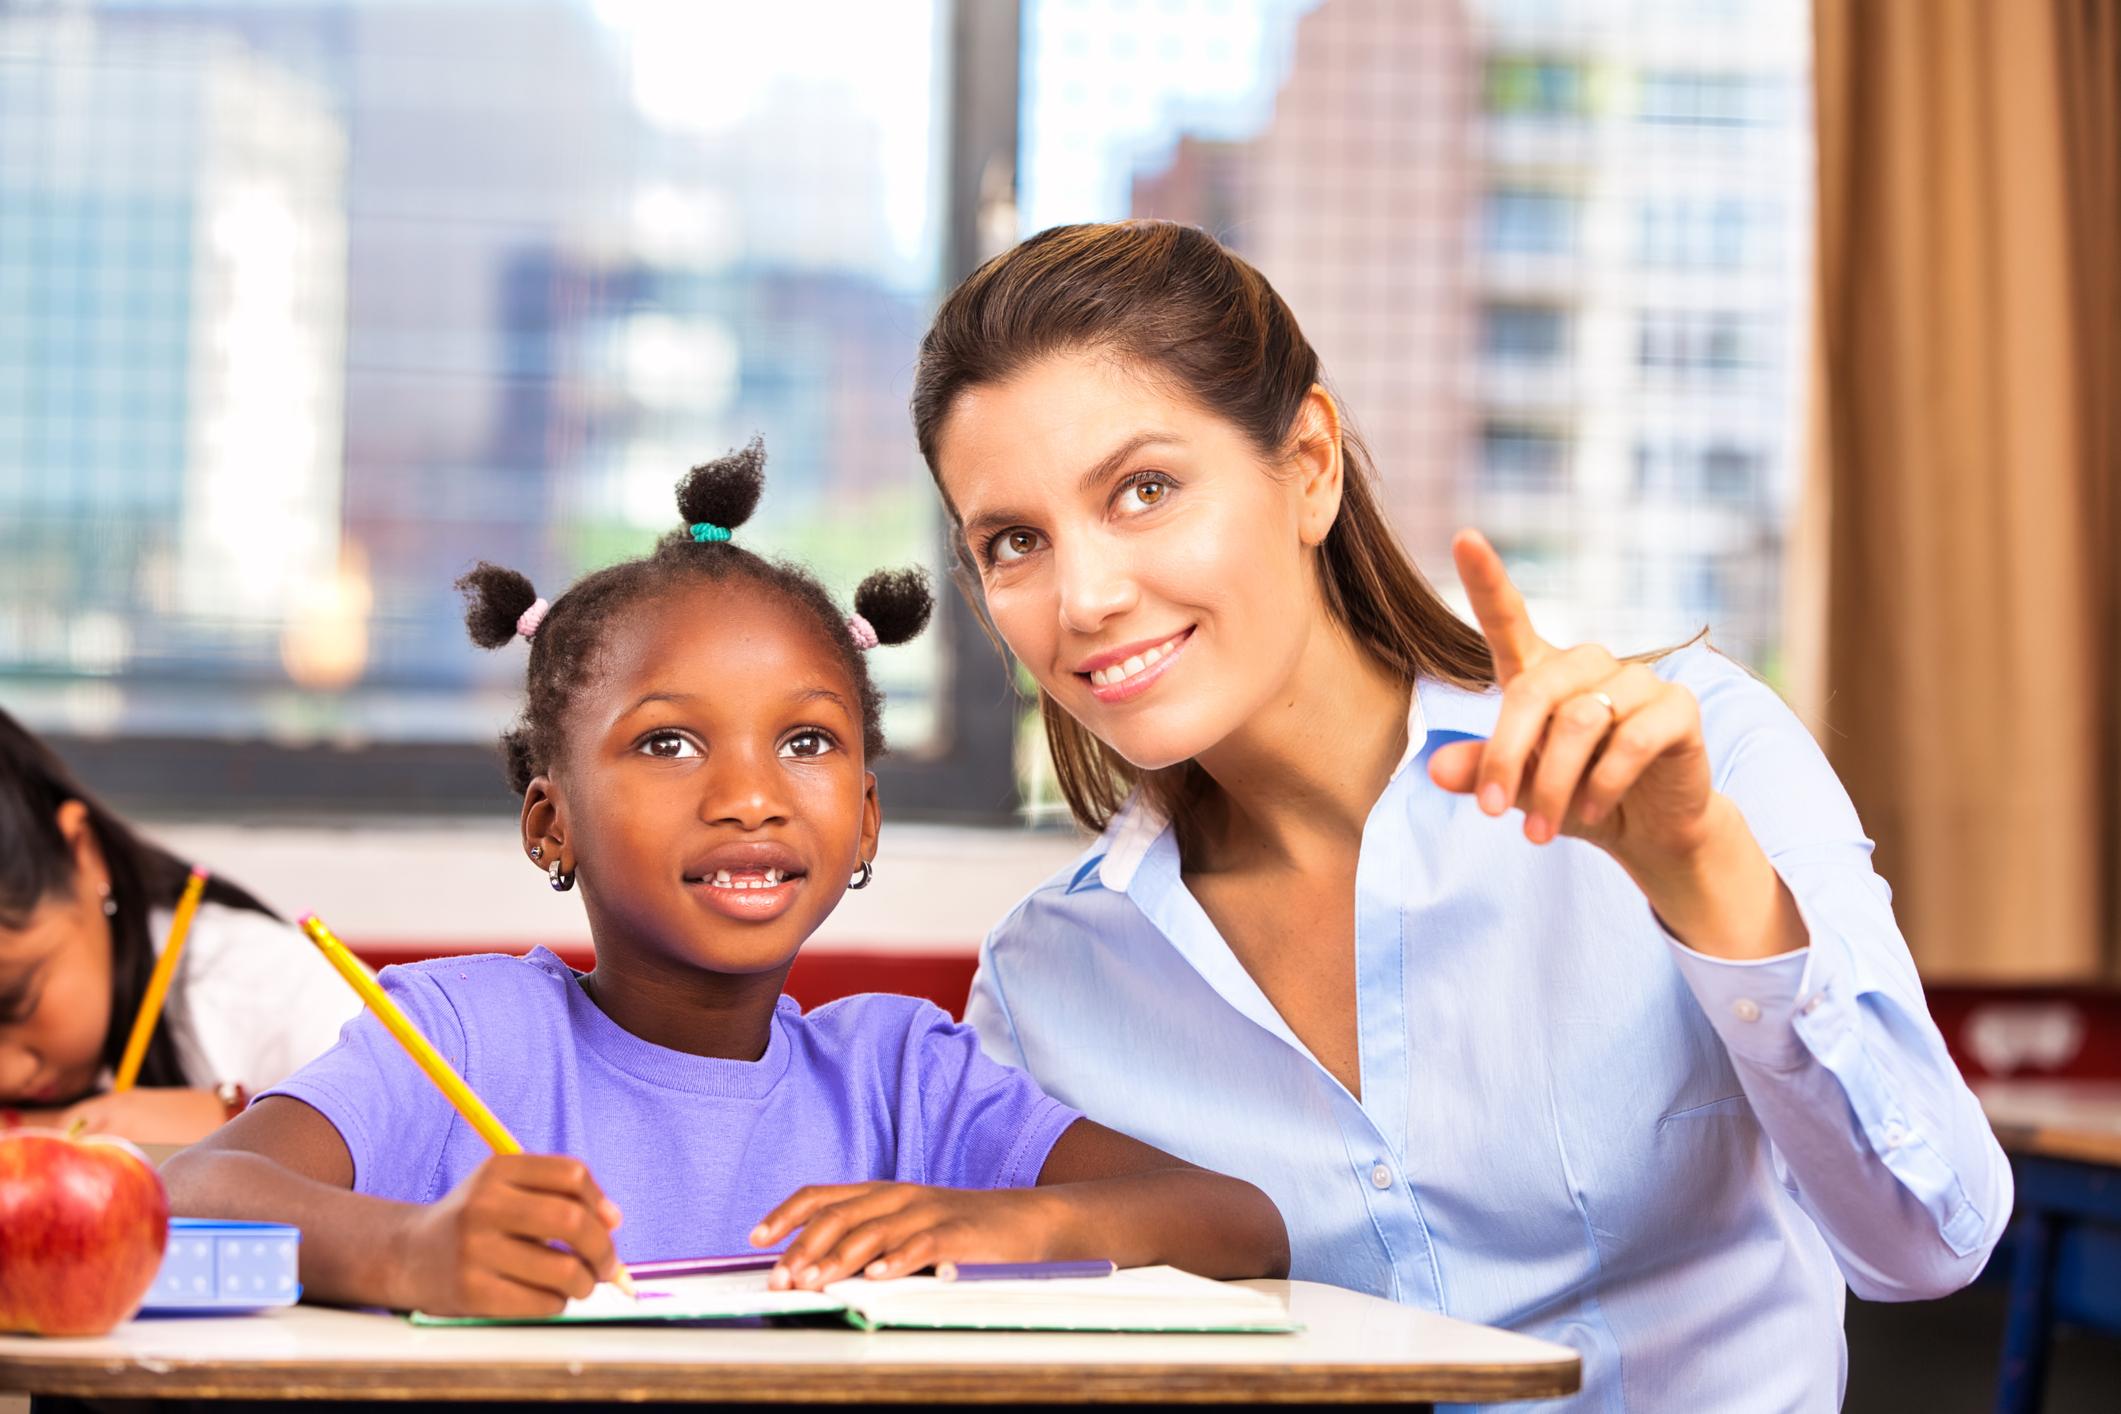 Teacher with student